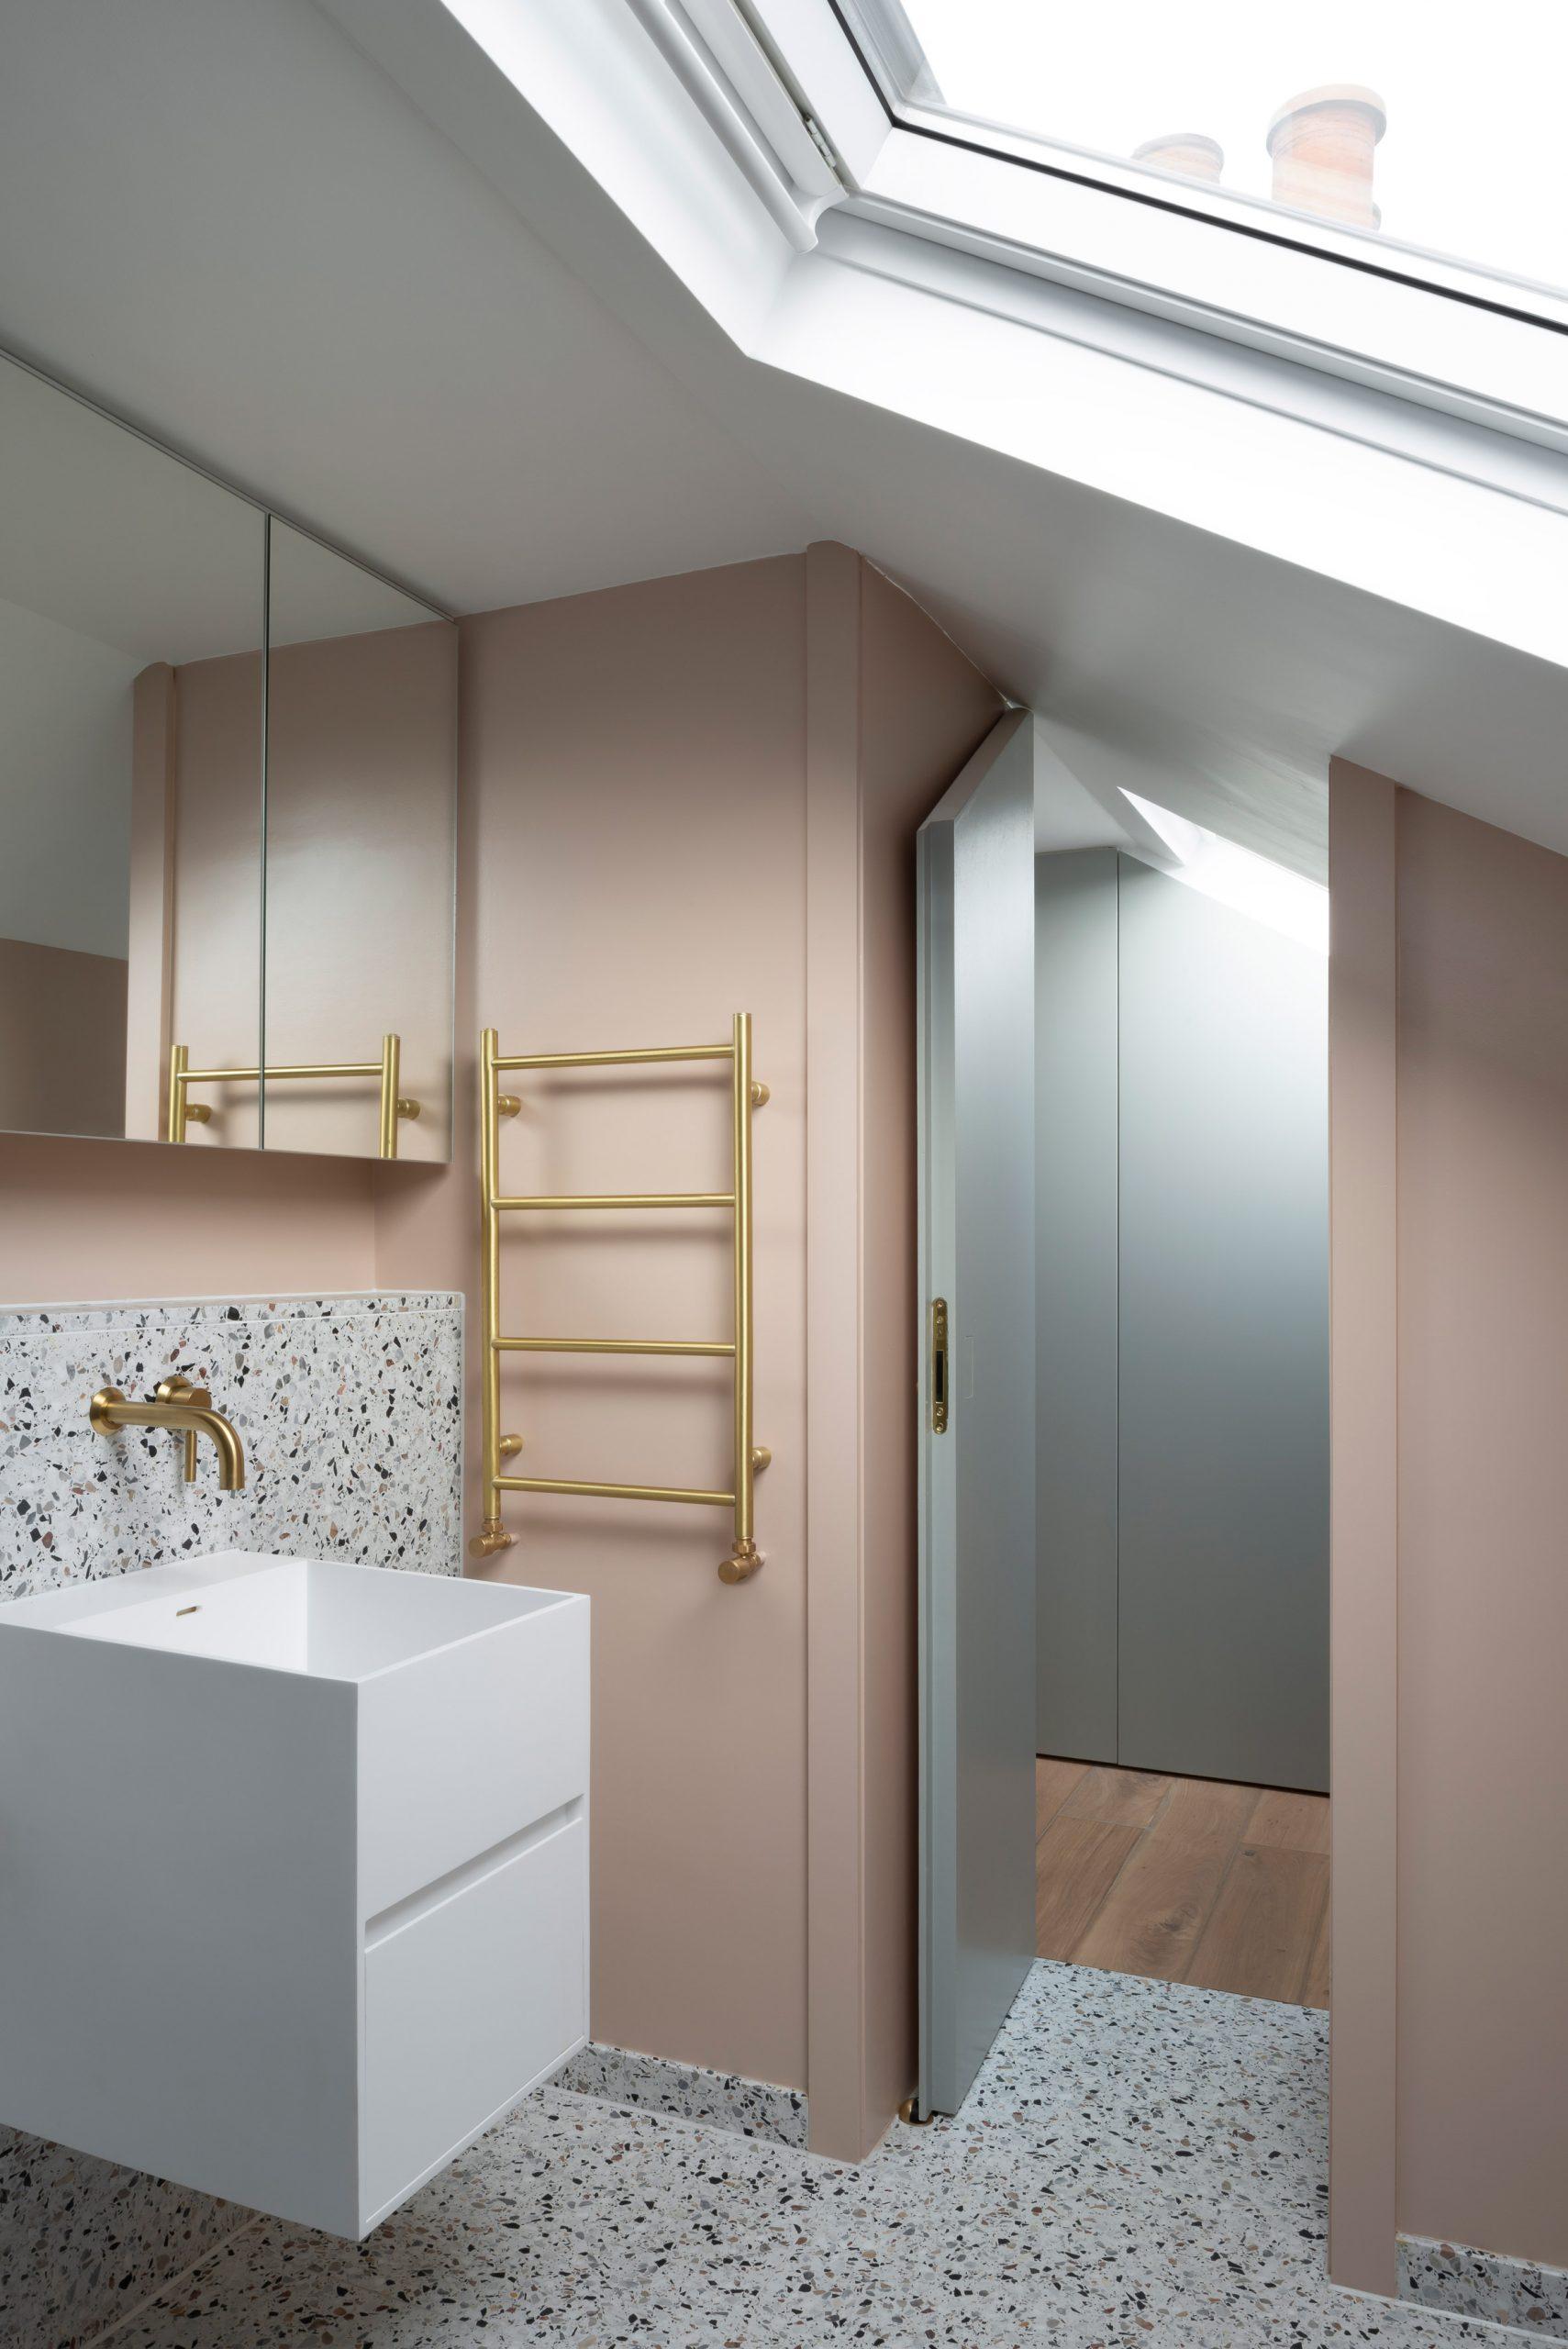 Bathroom in Frame House by Bureau de Change